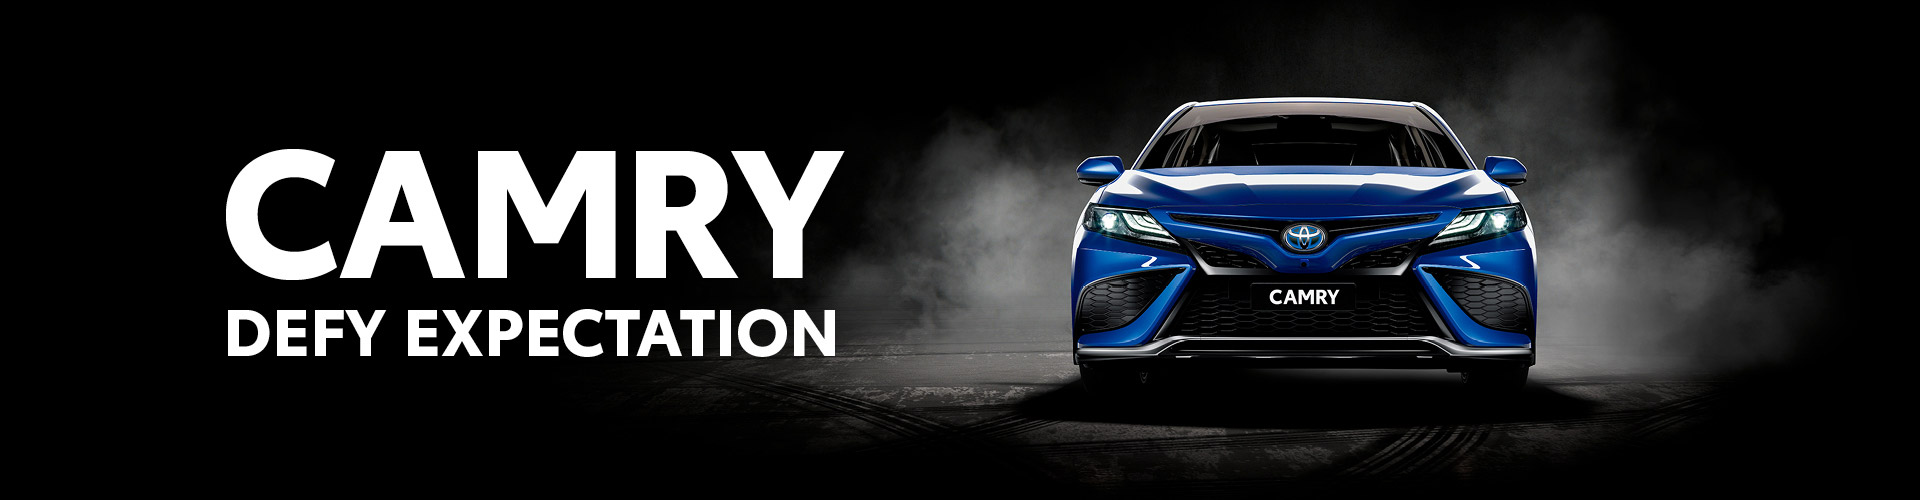 Toyota Camry 2021 - Defy Expectation